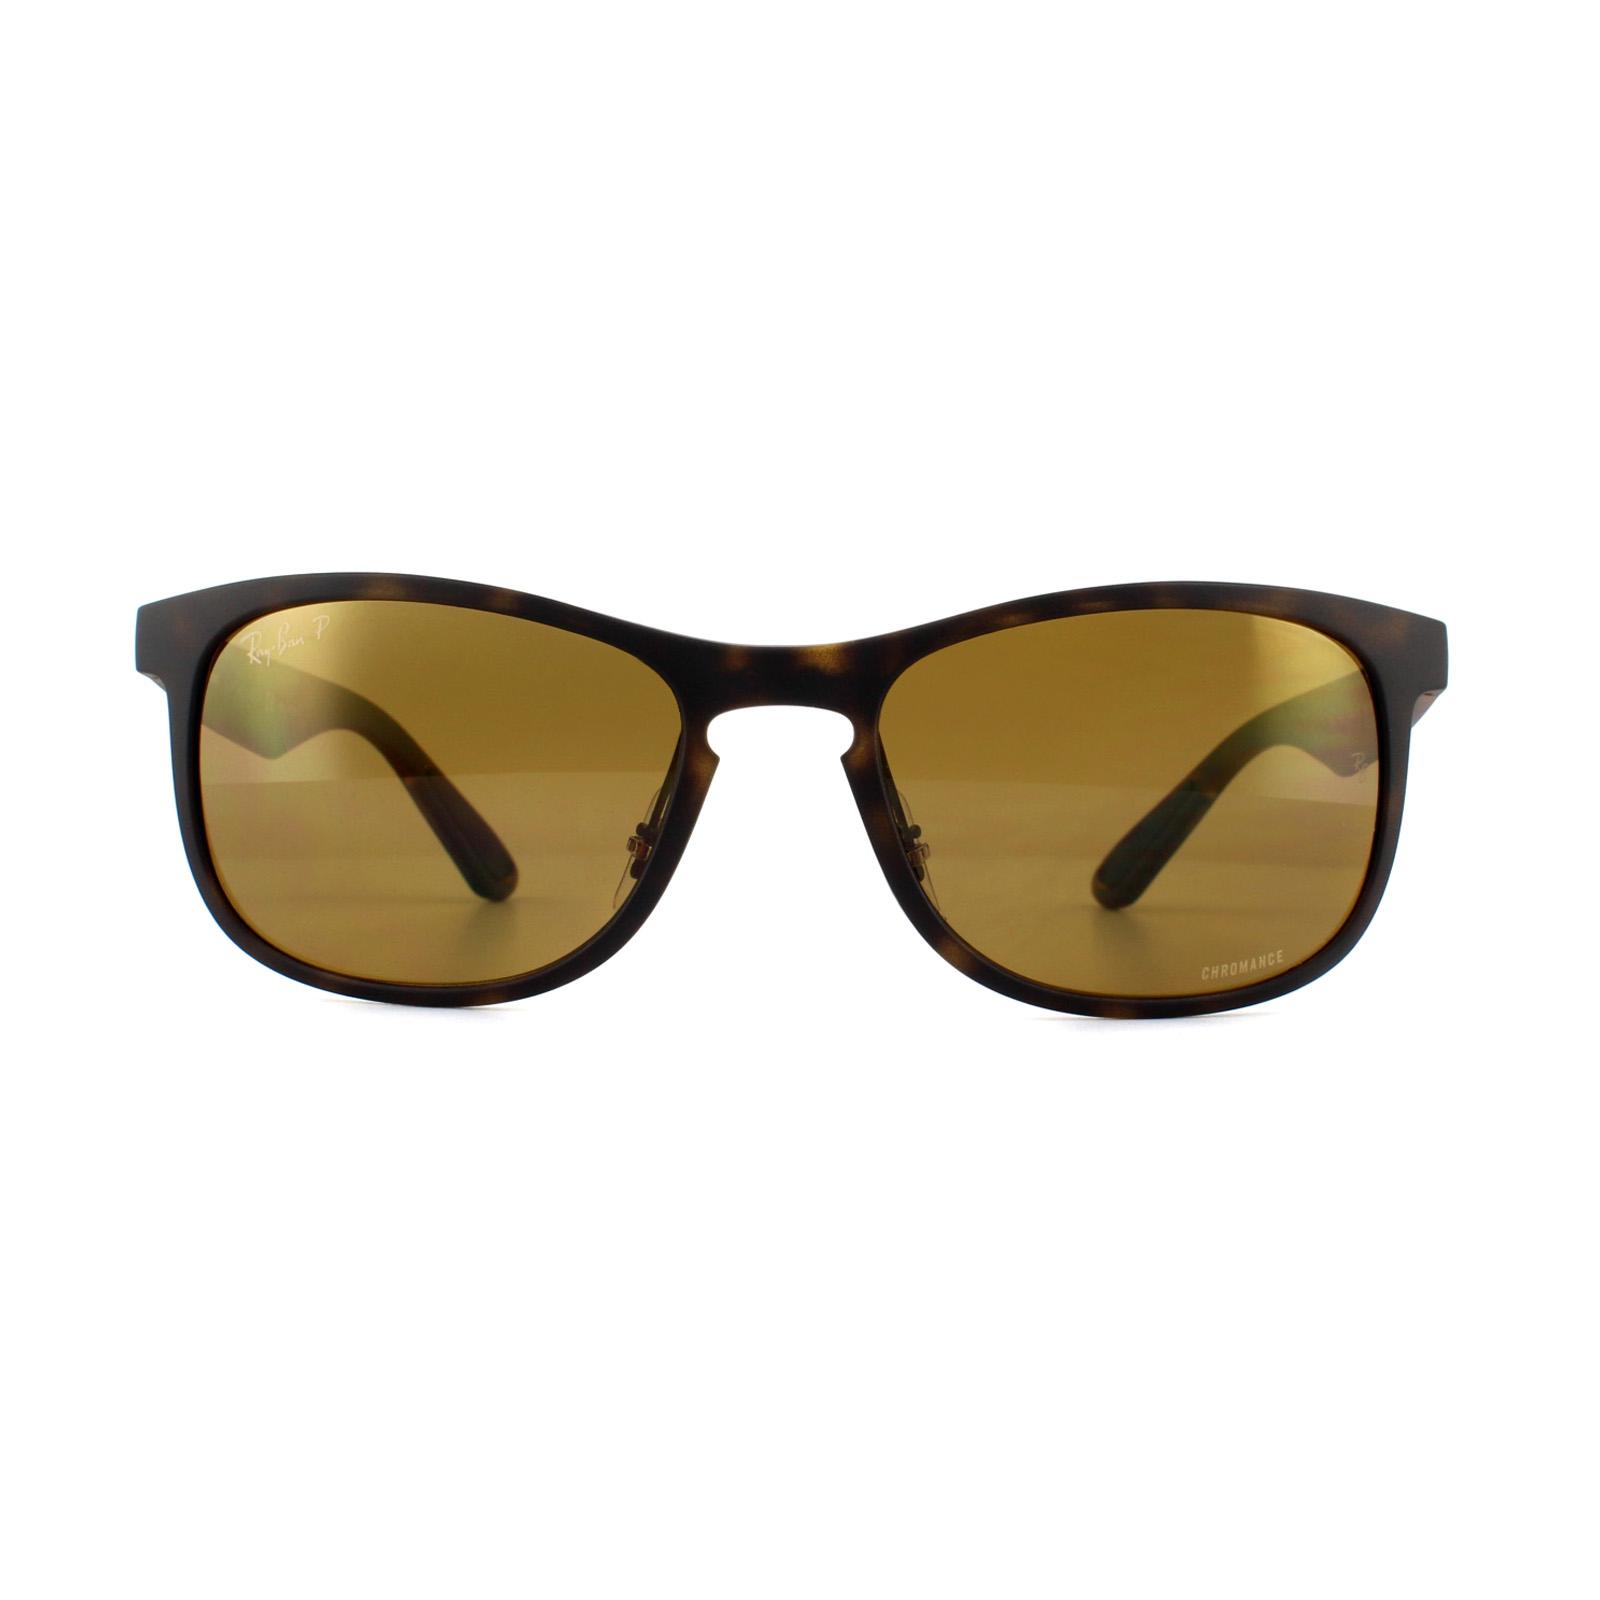 020d0543172 Sentinel Ray-Ban Sunglasses RB4263 894 A3 Matte Havana Bronze Polarized  Miror Chromance